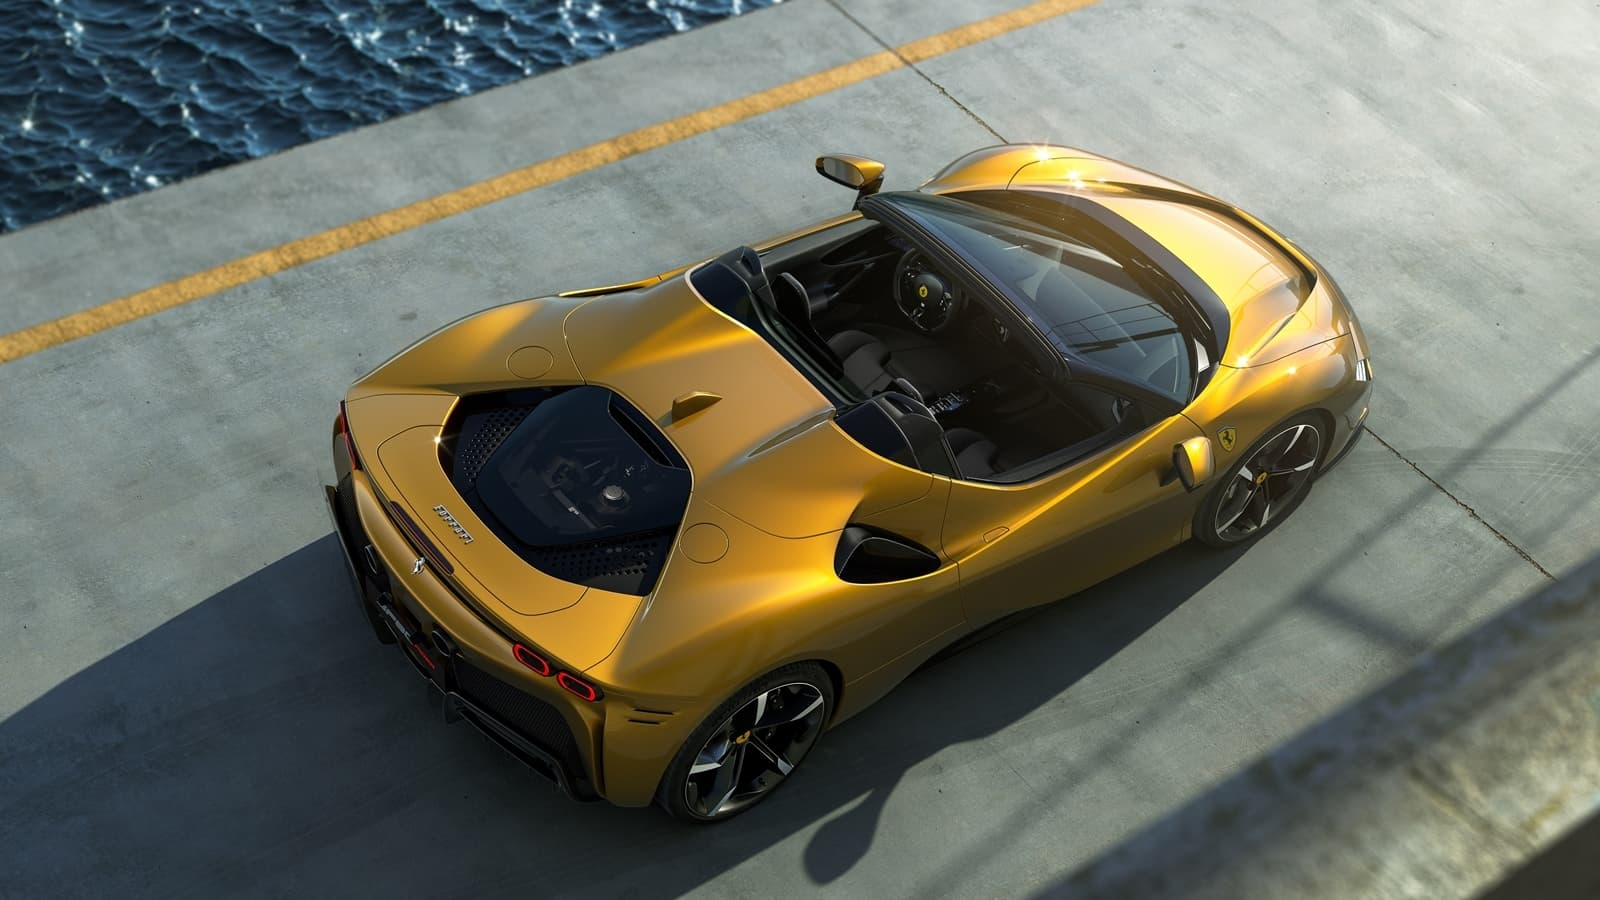 Ferrari Sf90 Spider 2021 1120 006